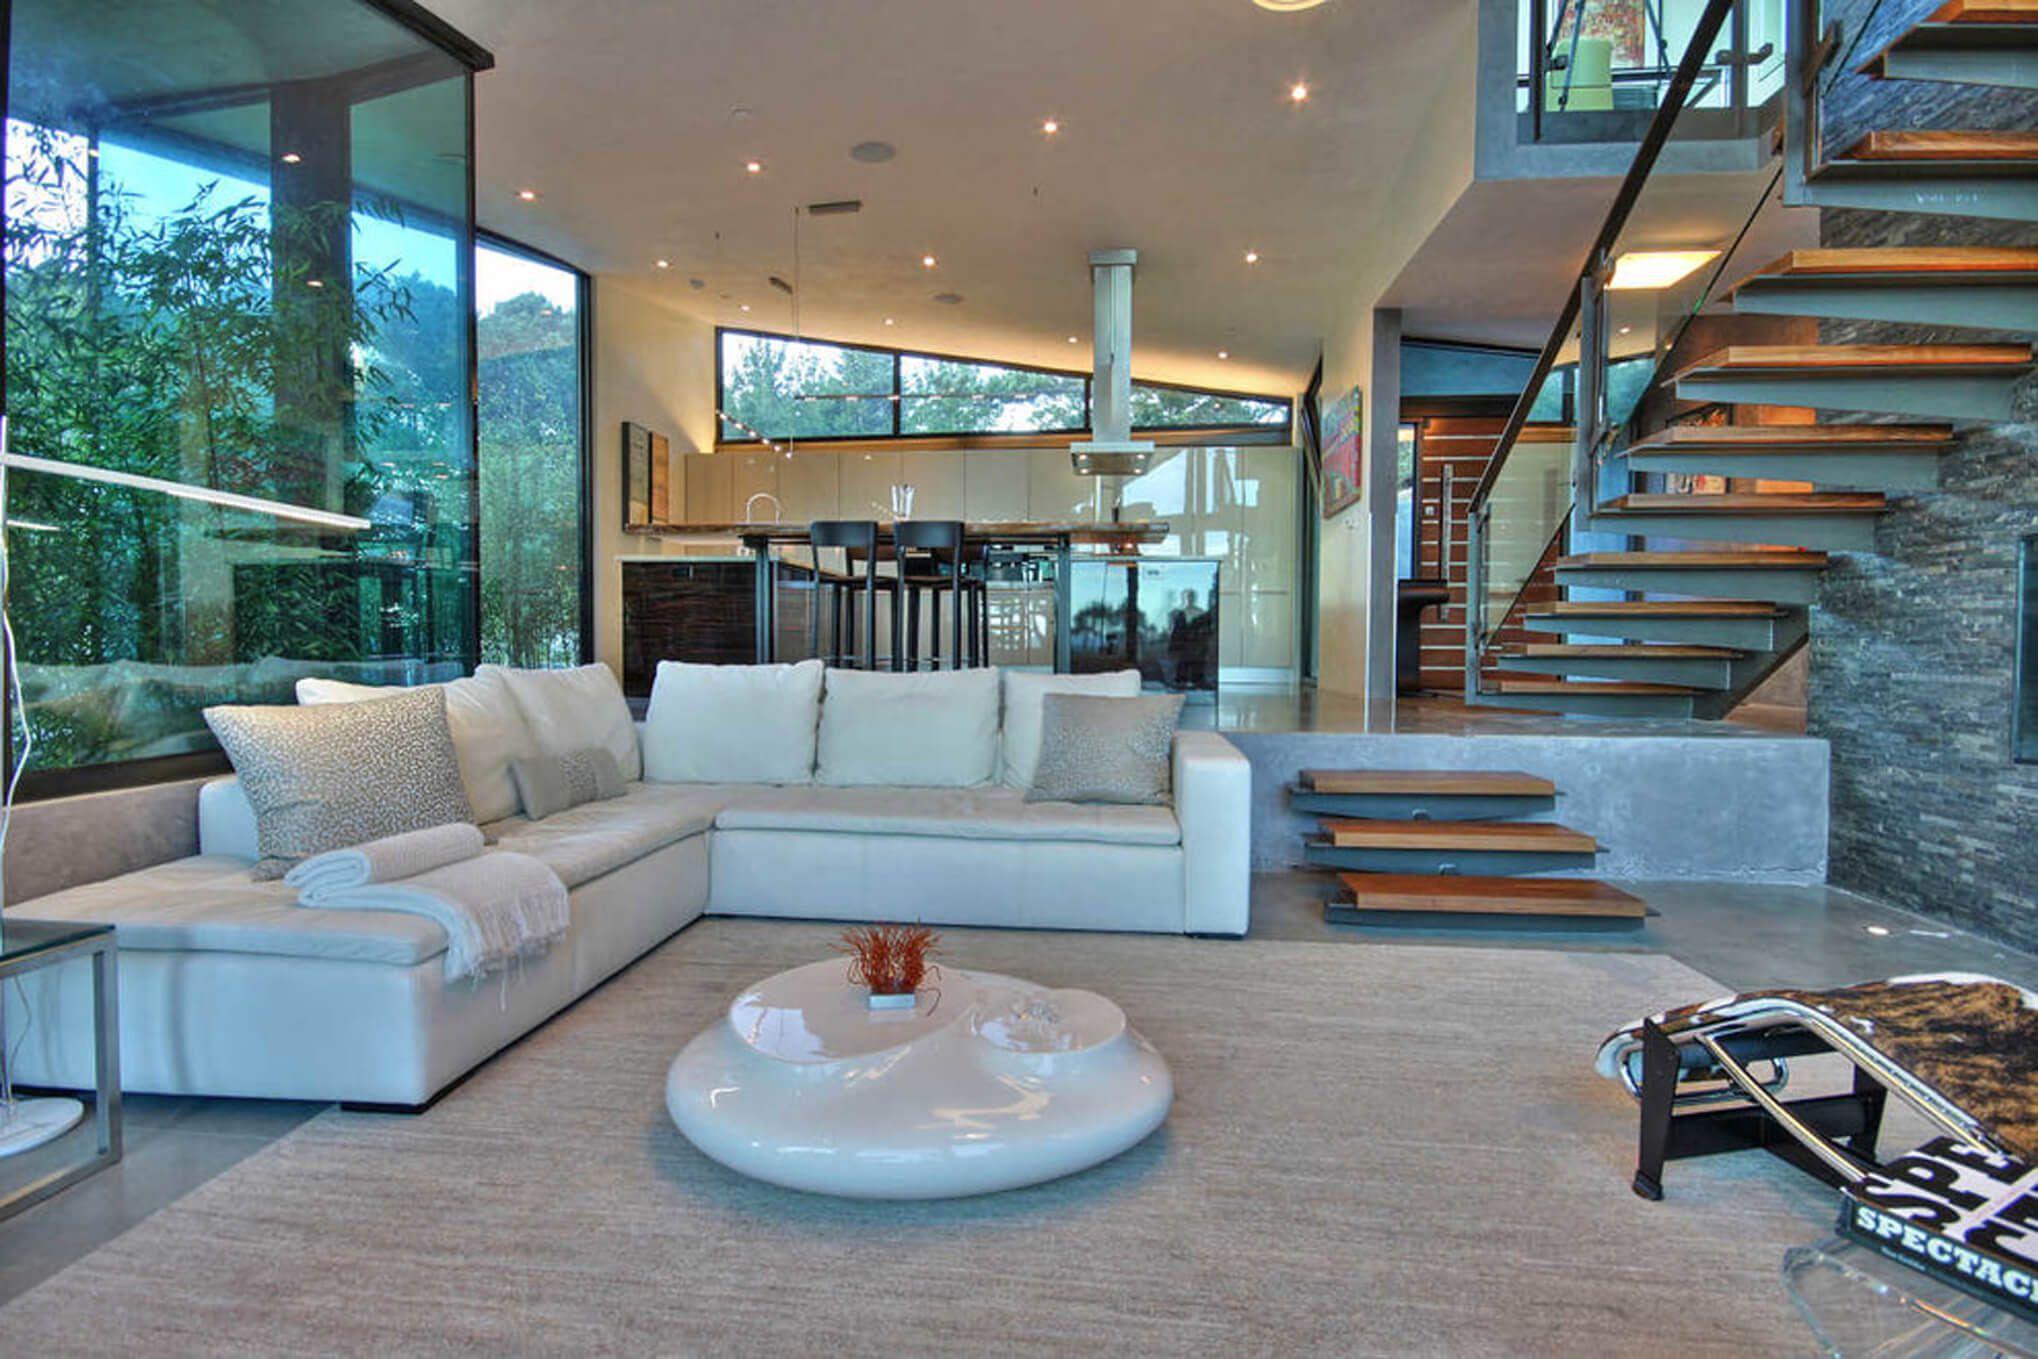 Modern and contemporary living room by Interior Designer, RM Interiors of Cincinnati, Ohio.